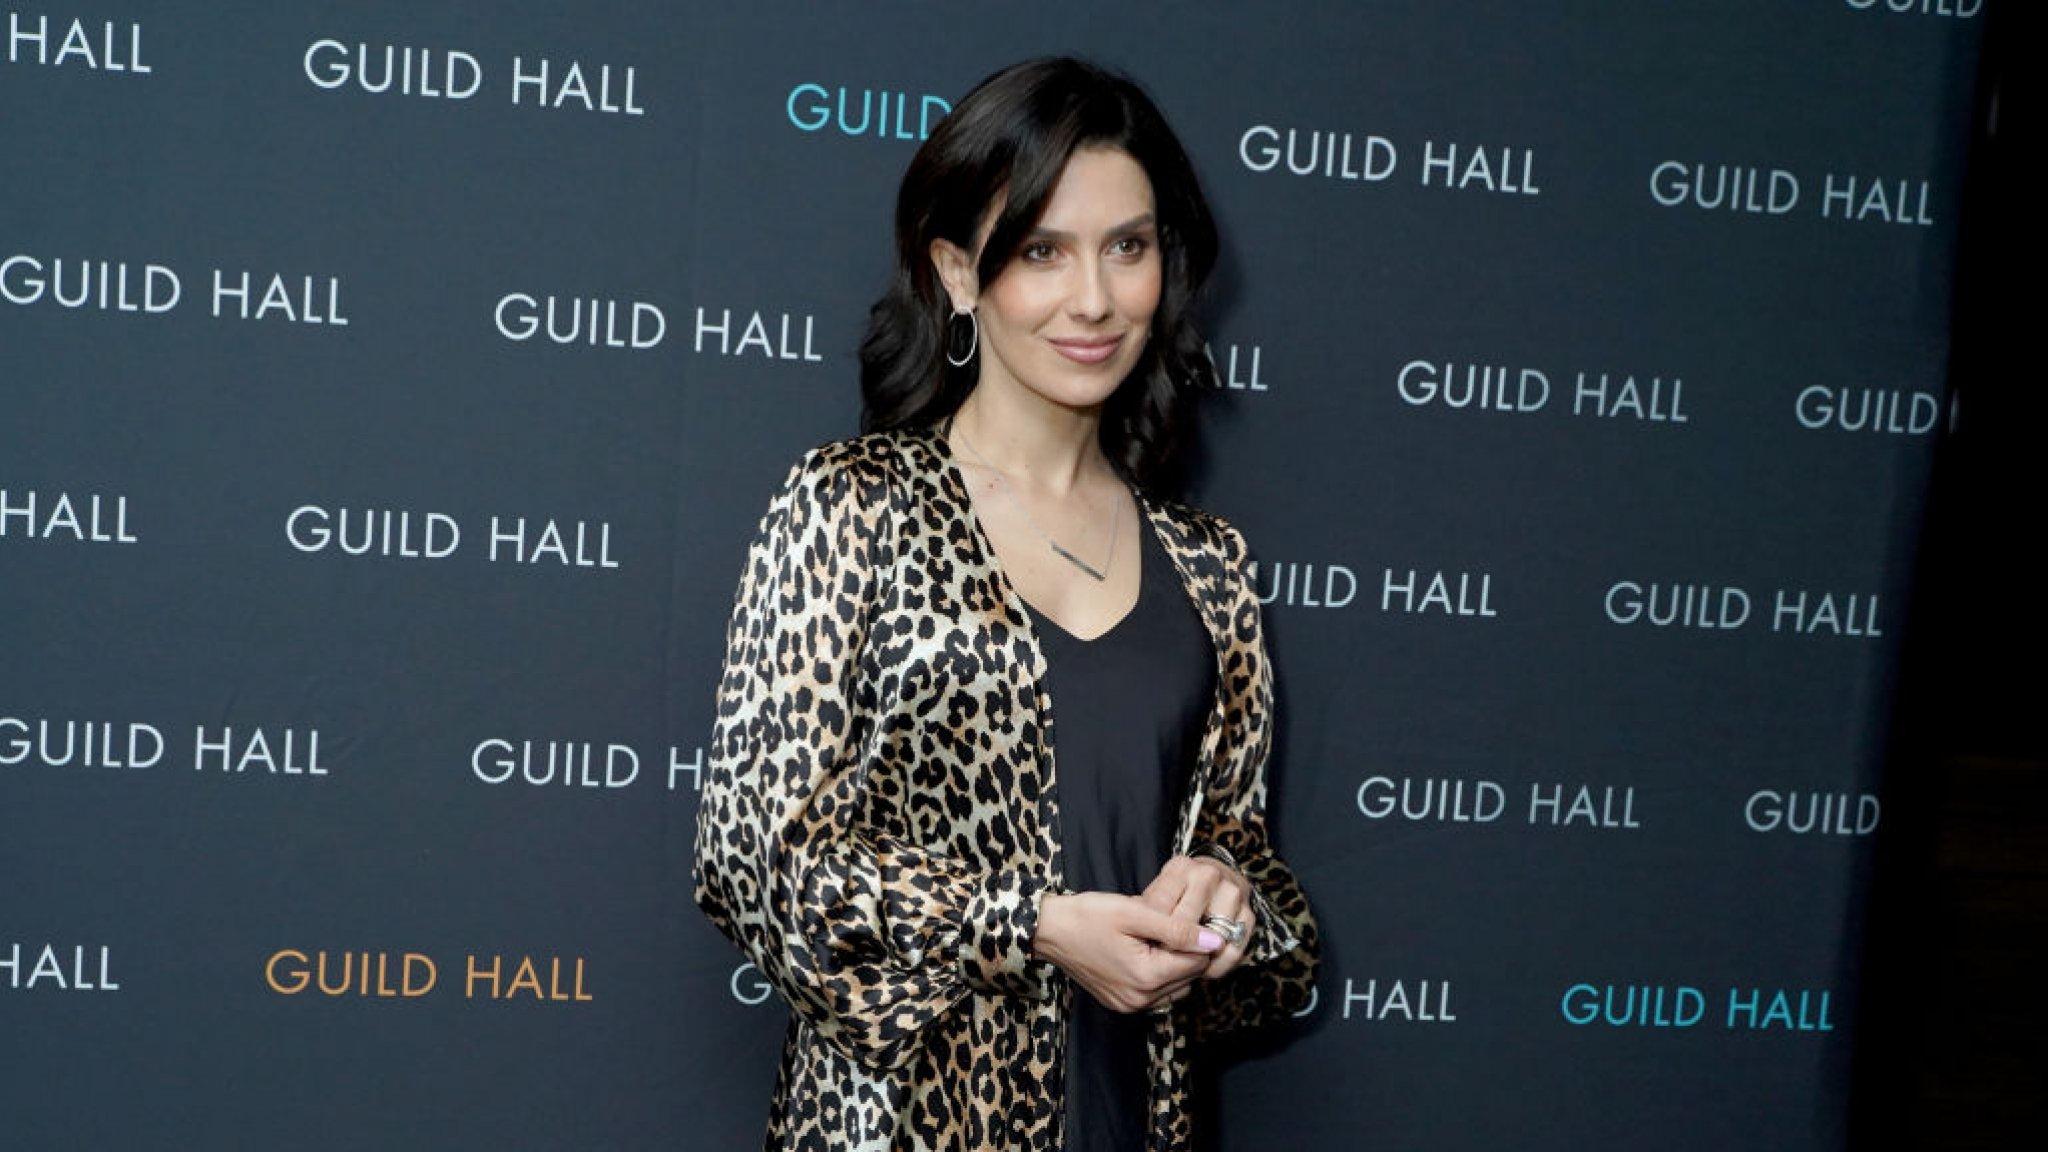 Hilaria Baldwin zegt sorry na ophef over 'nepaccent' - RTL Boulevard